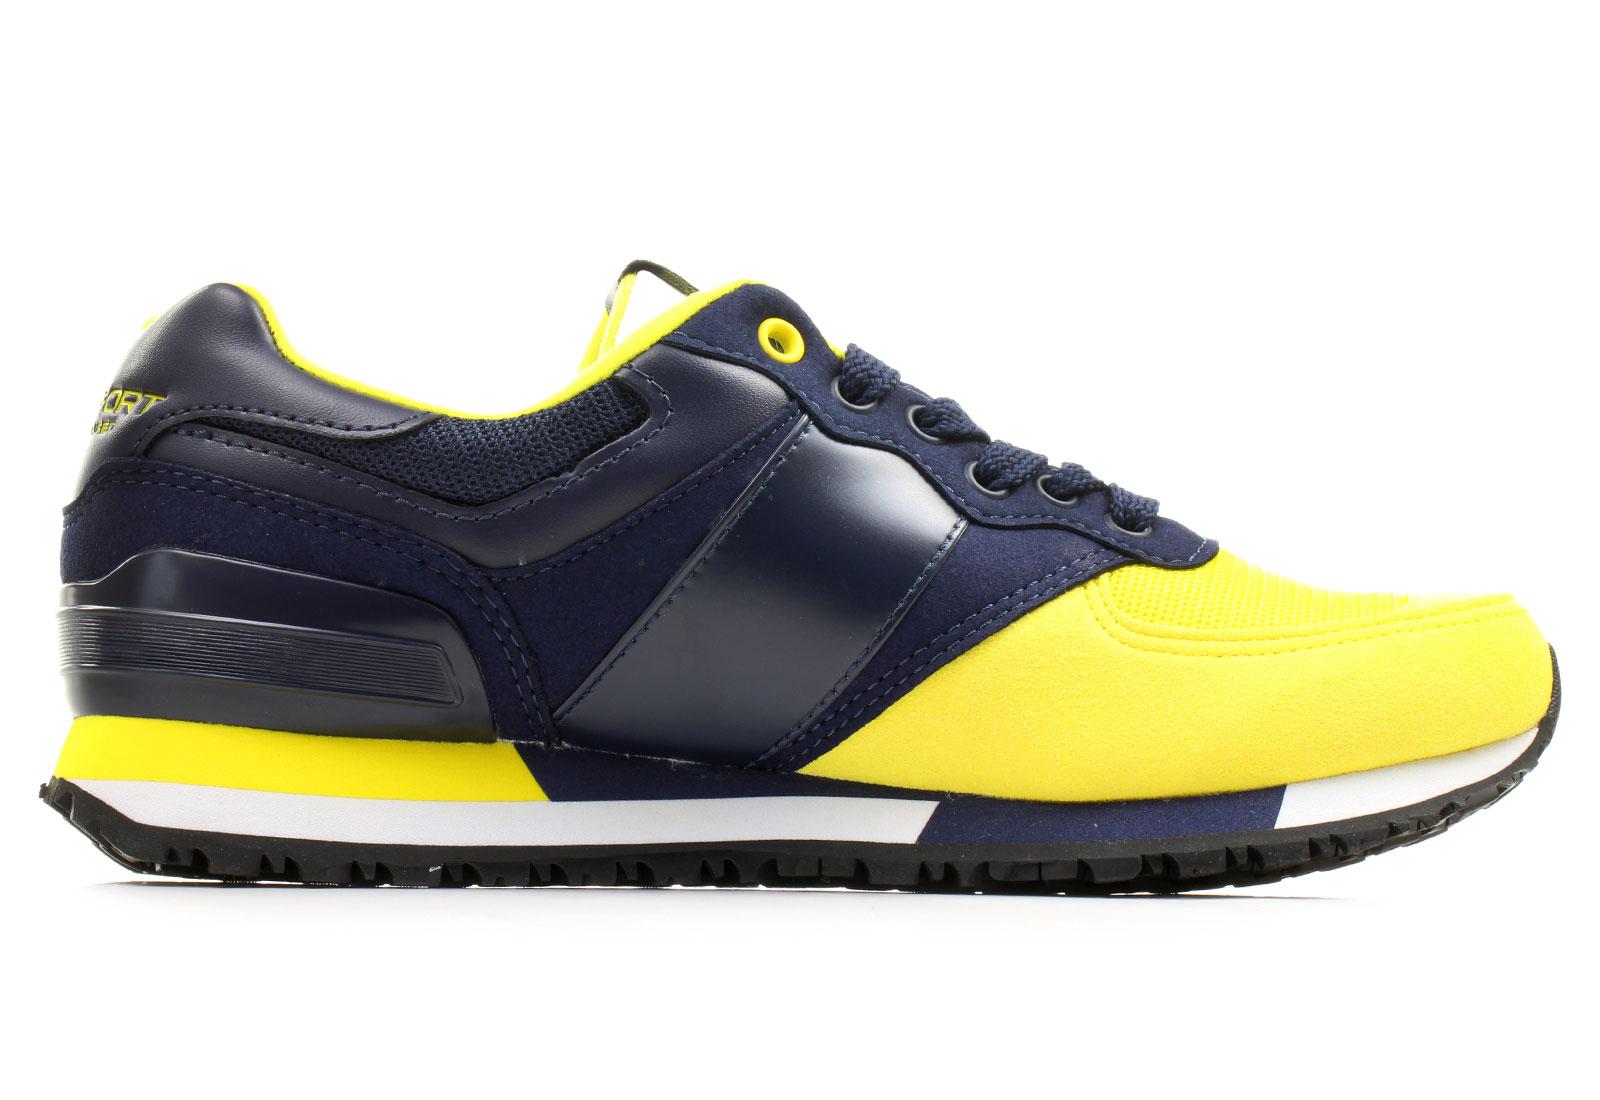 Polo Ralph Lauren Cipő - Slaton Rl - APP3-R-W4NUY - Office Shoes ... fc31c2cedb